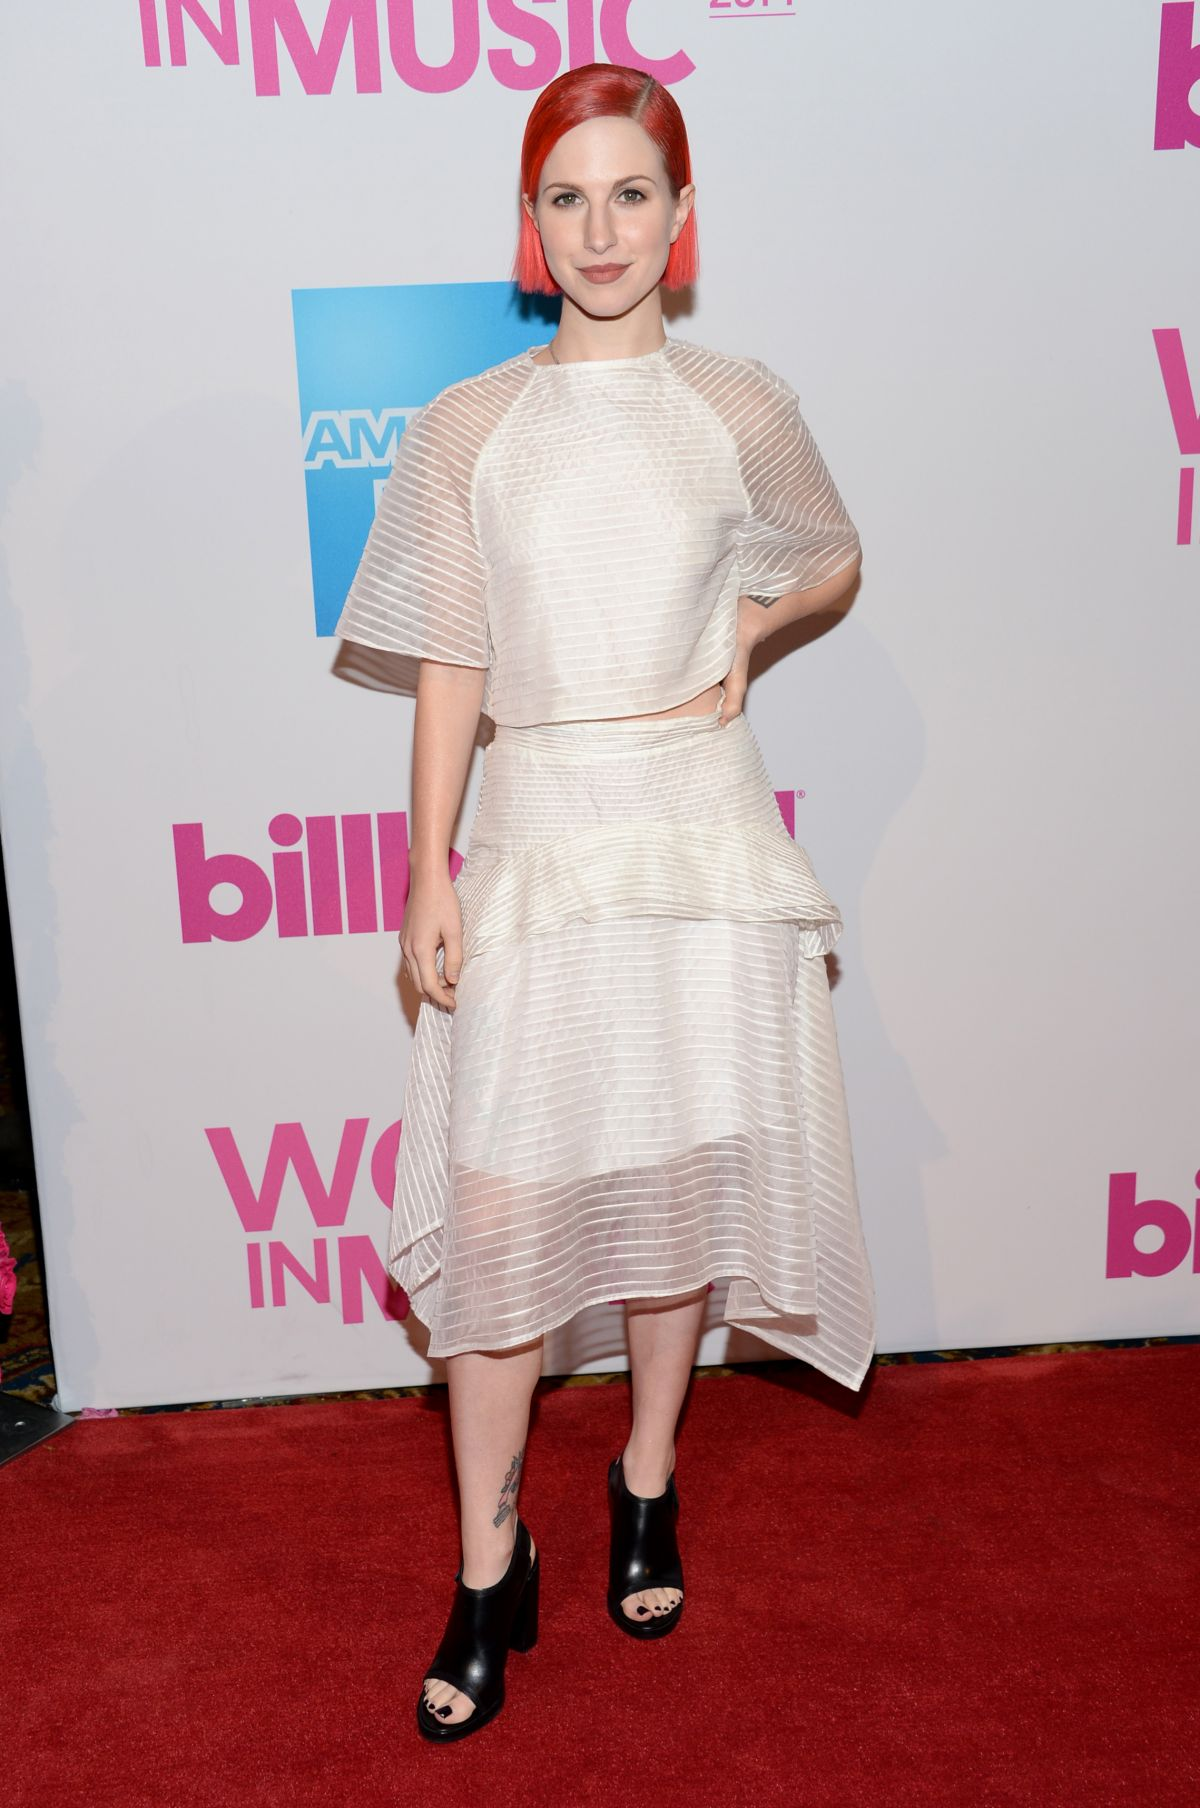 HAYLEY WILLIAMS at 2014 Billboard Women In Music Luncheon in New York